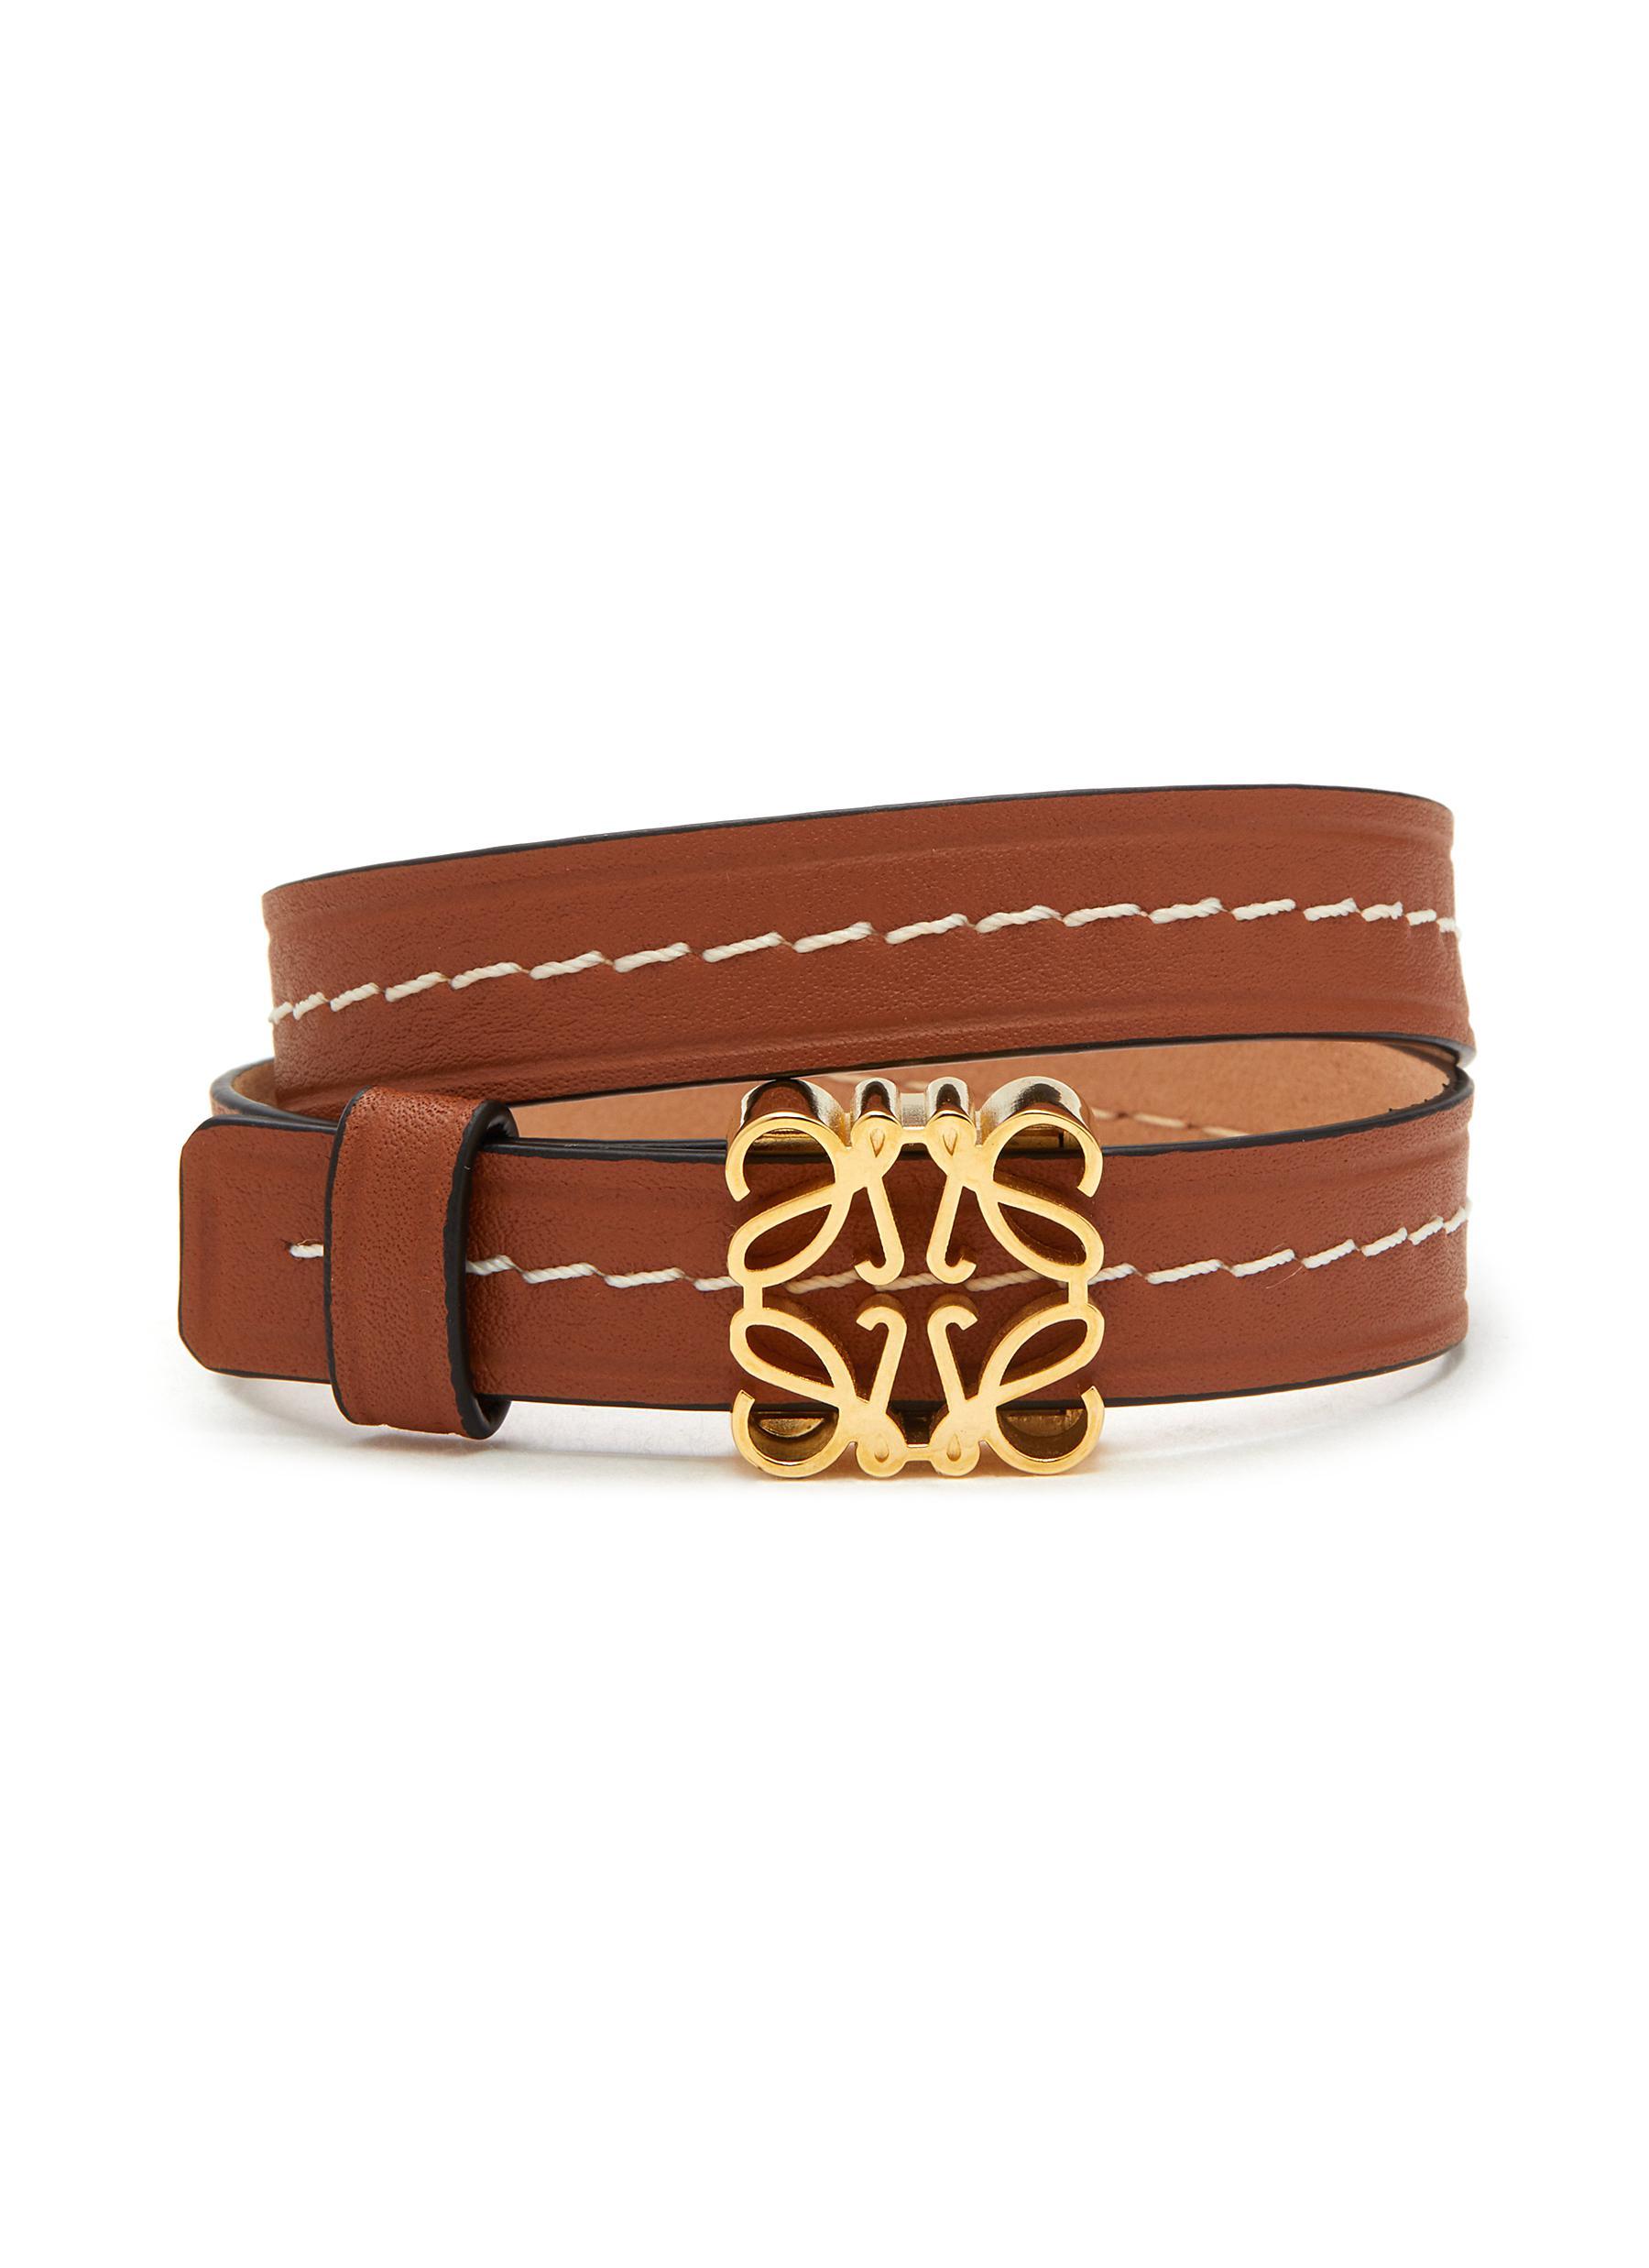 Anagram Plaque Double Strap Leather Bracelet - LOEWE - Modalova